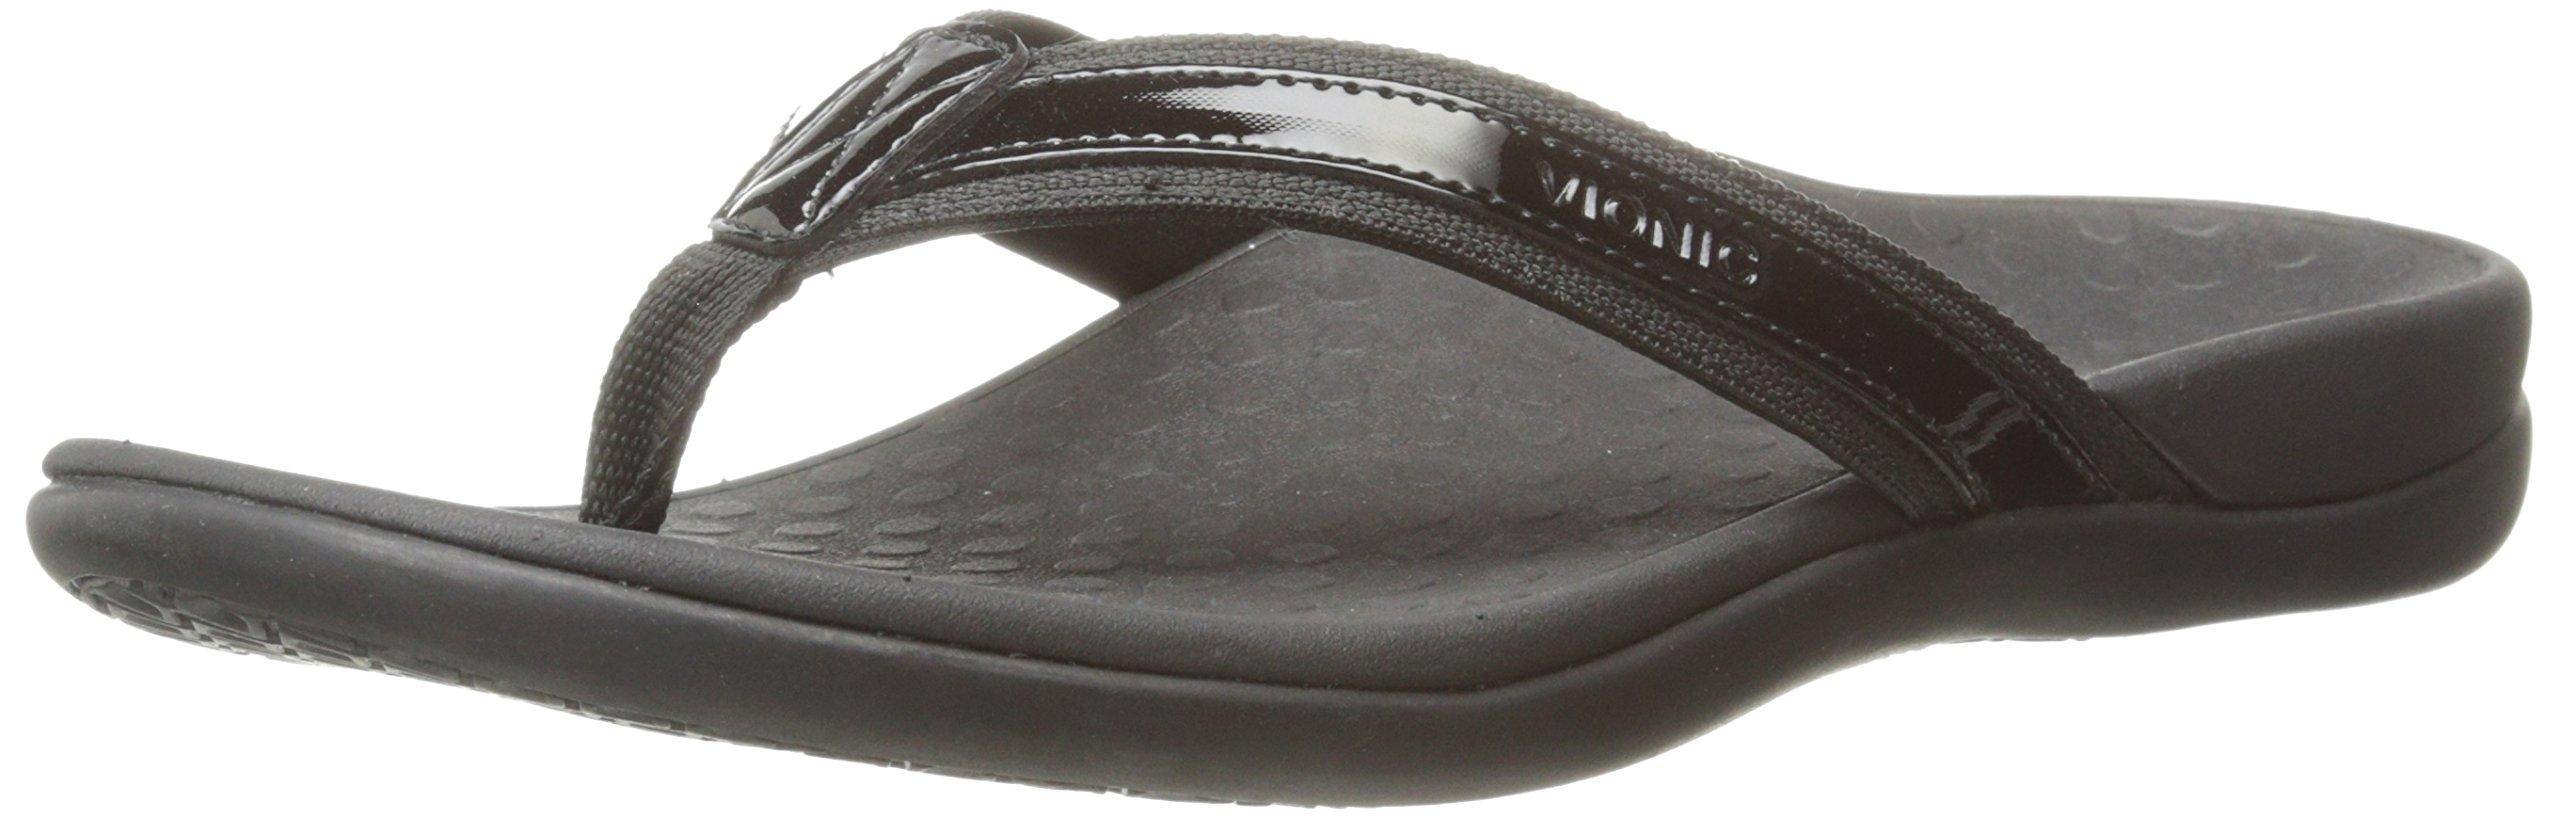 Vionic Orthaheel Womens Tide II Sandal Black Size 8